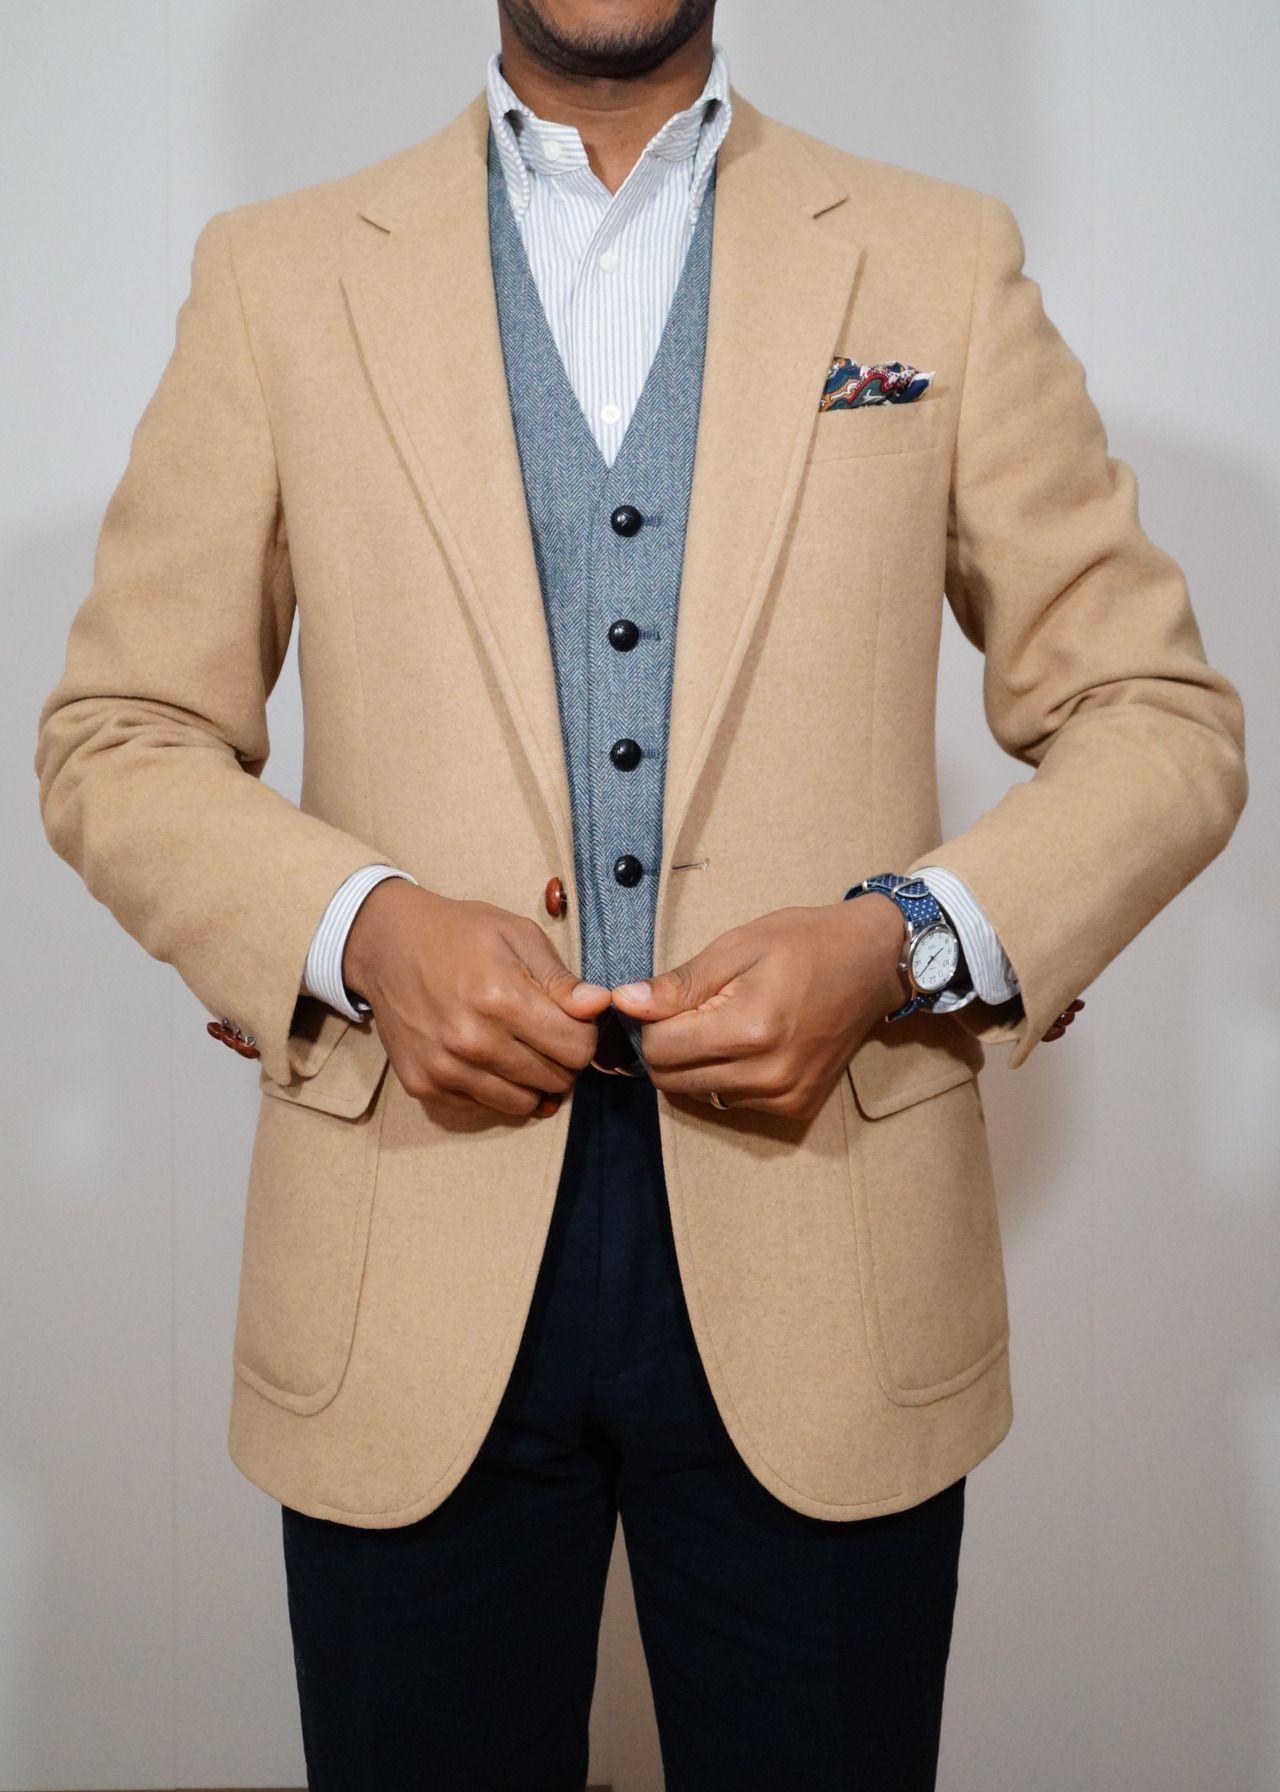 Beige jacket white shirt with light blue dress stripes